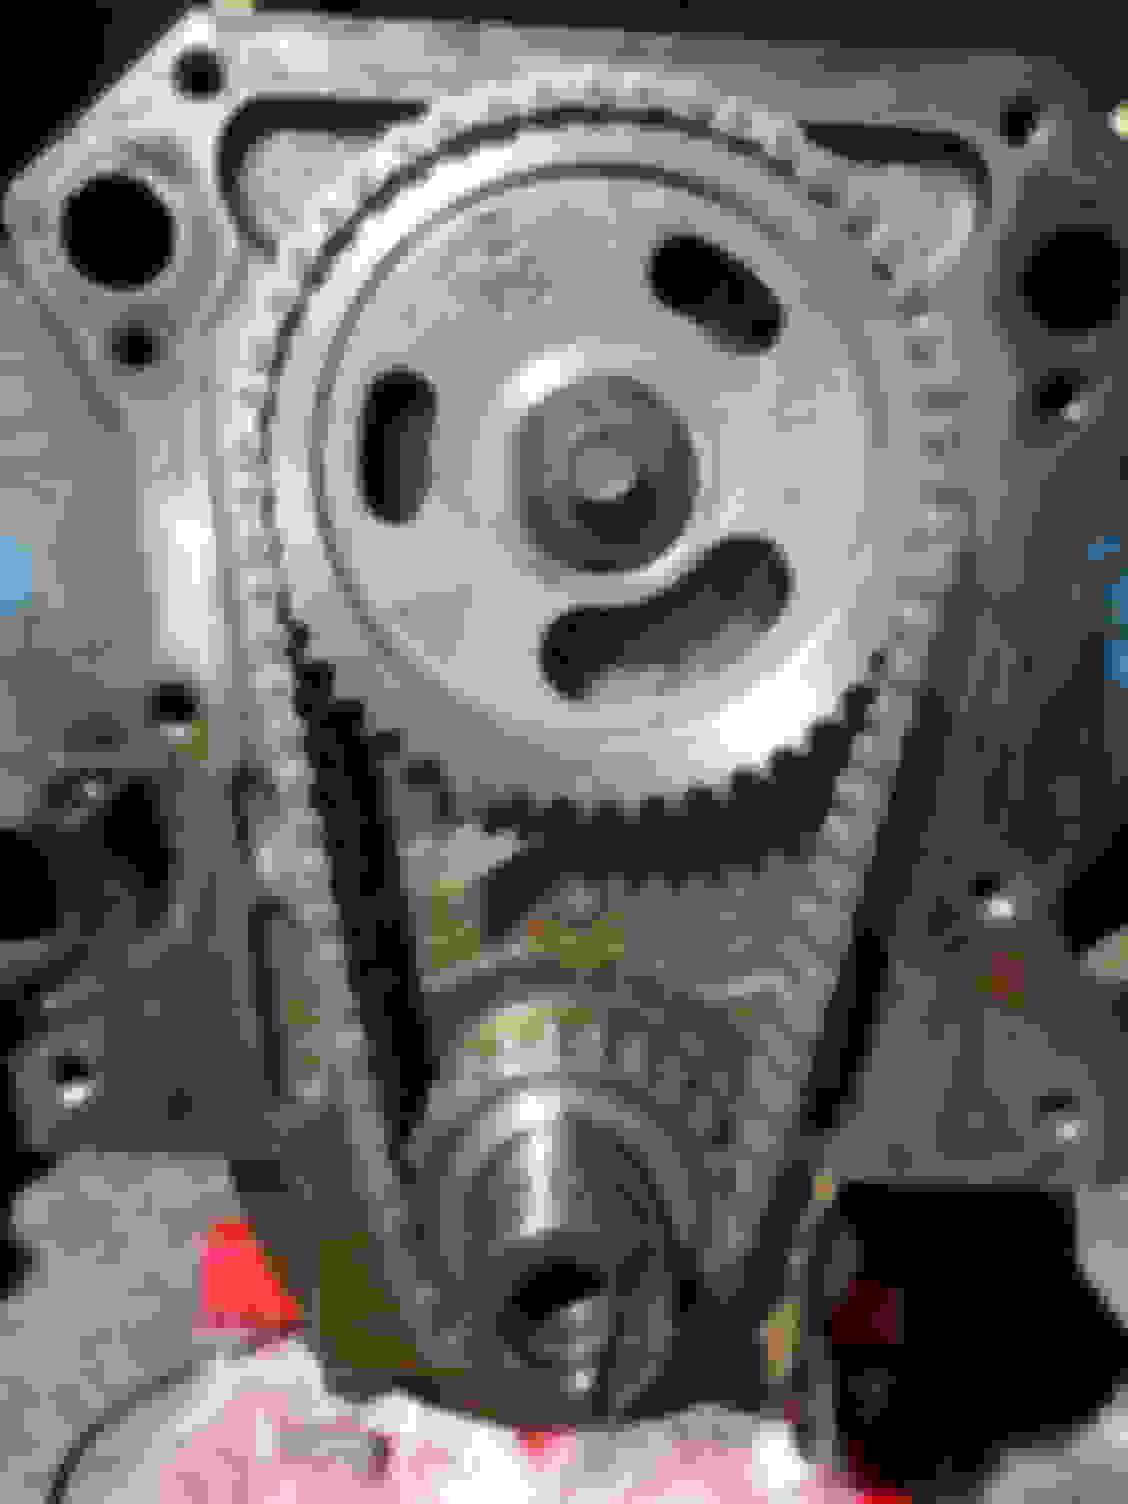 2000 1500 van error codes P0443, P0753, P1765 - DodgeForum com